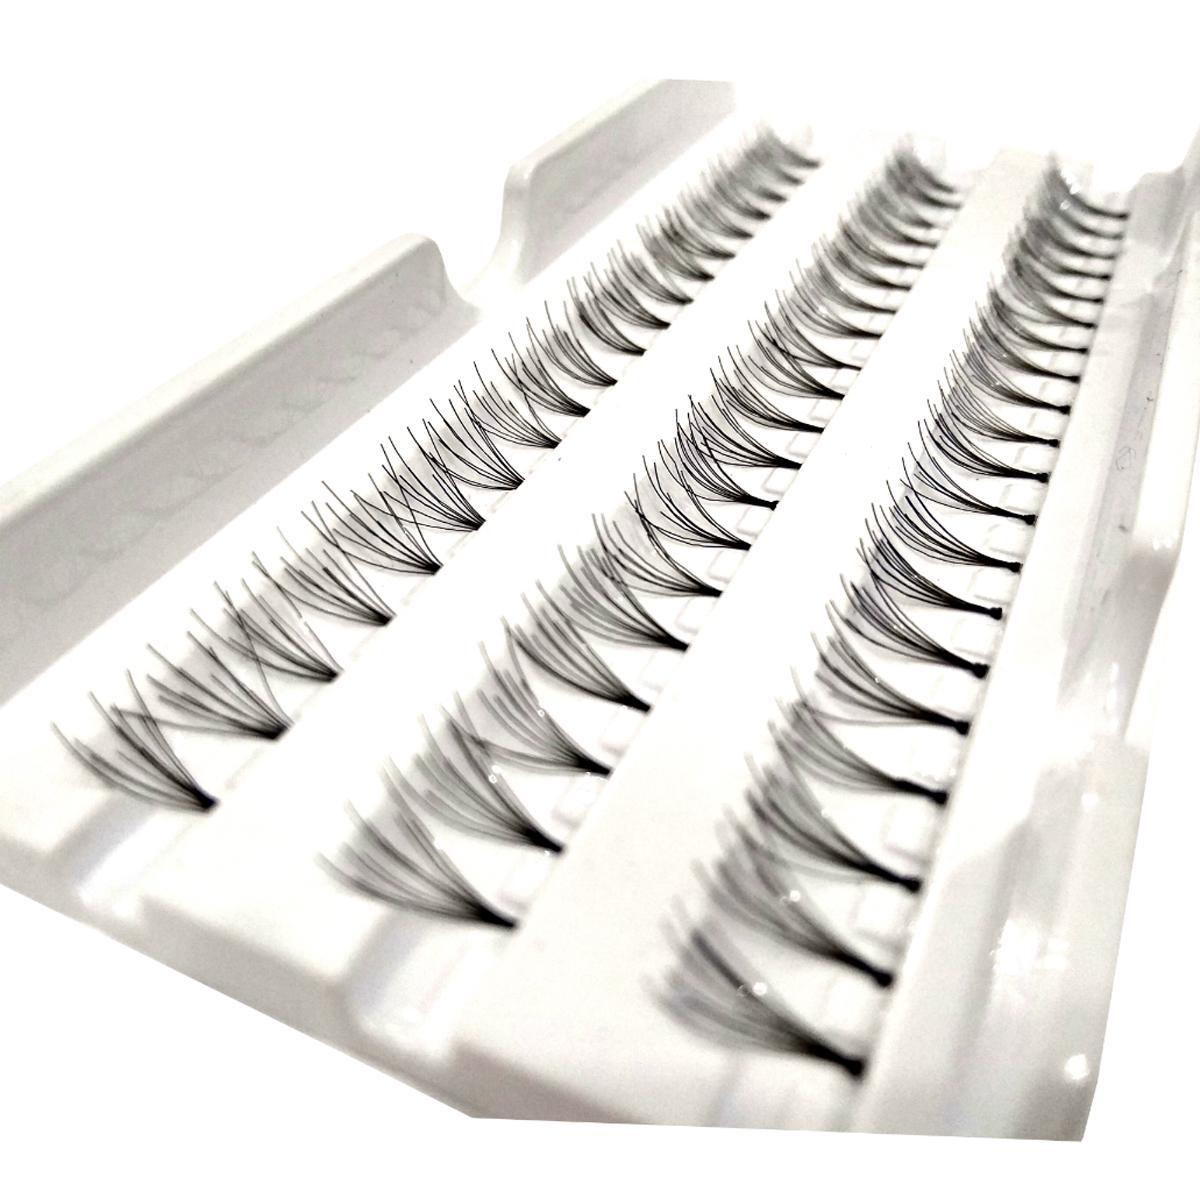 Bulu Mata Tanam CDL Eye Lash Eye Lashes Human Hair Export Quality 60 Pc - Black